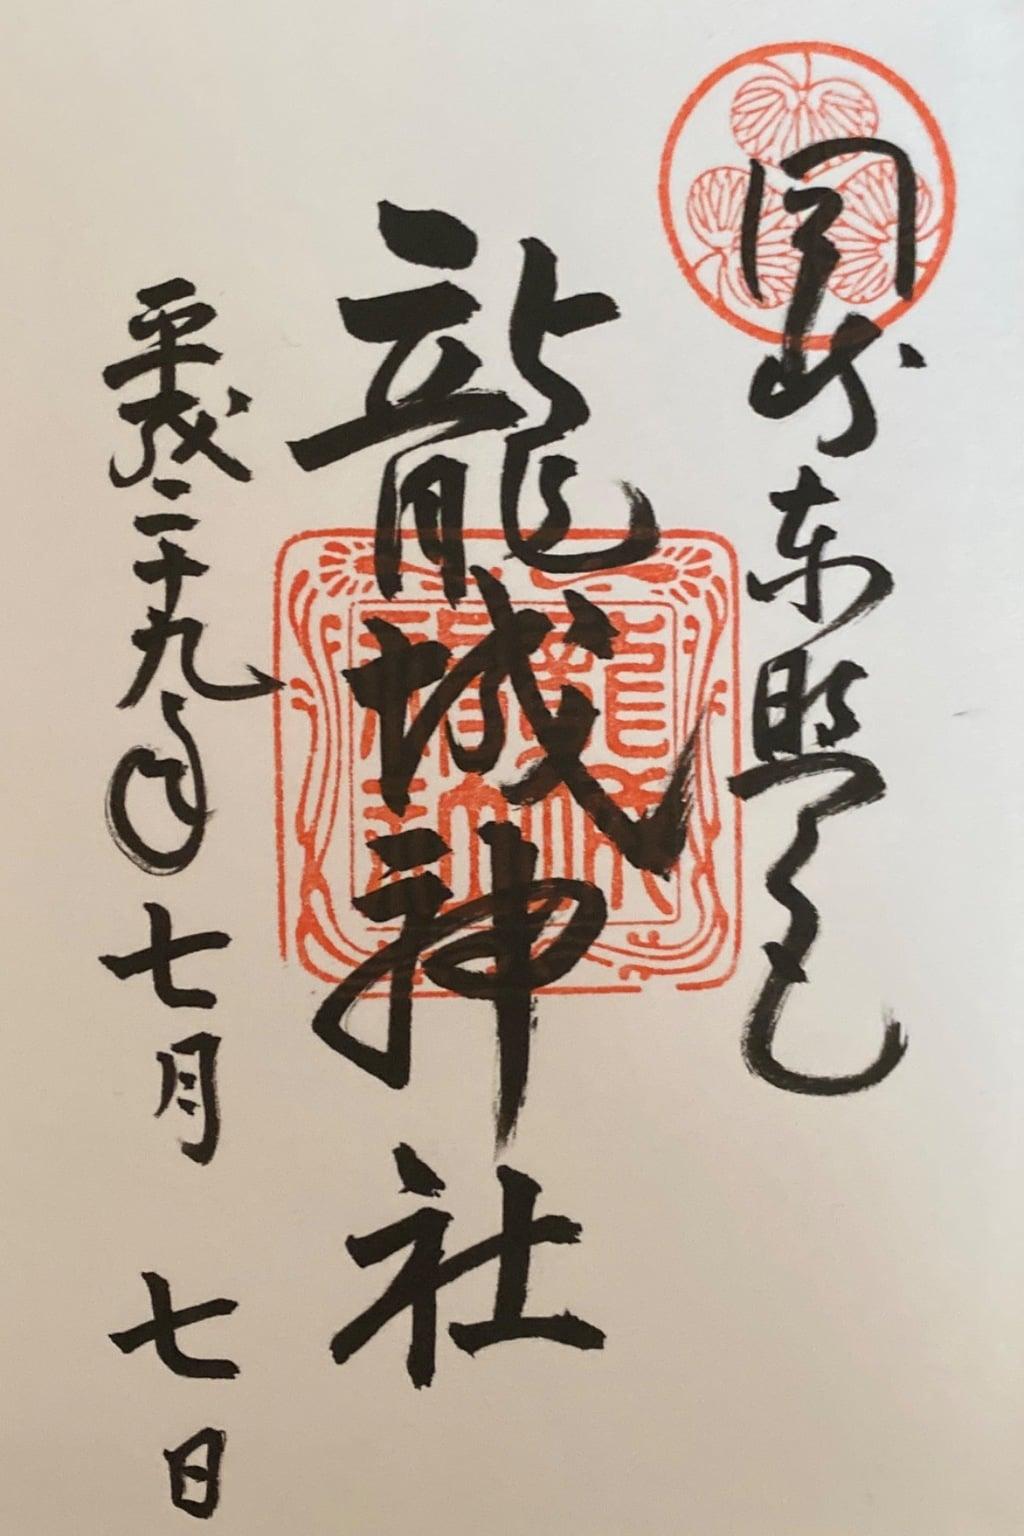 龍城神社の御朱印